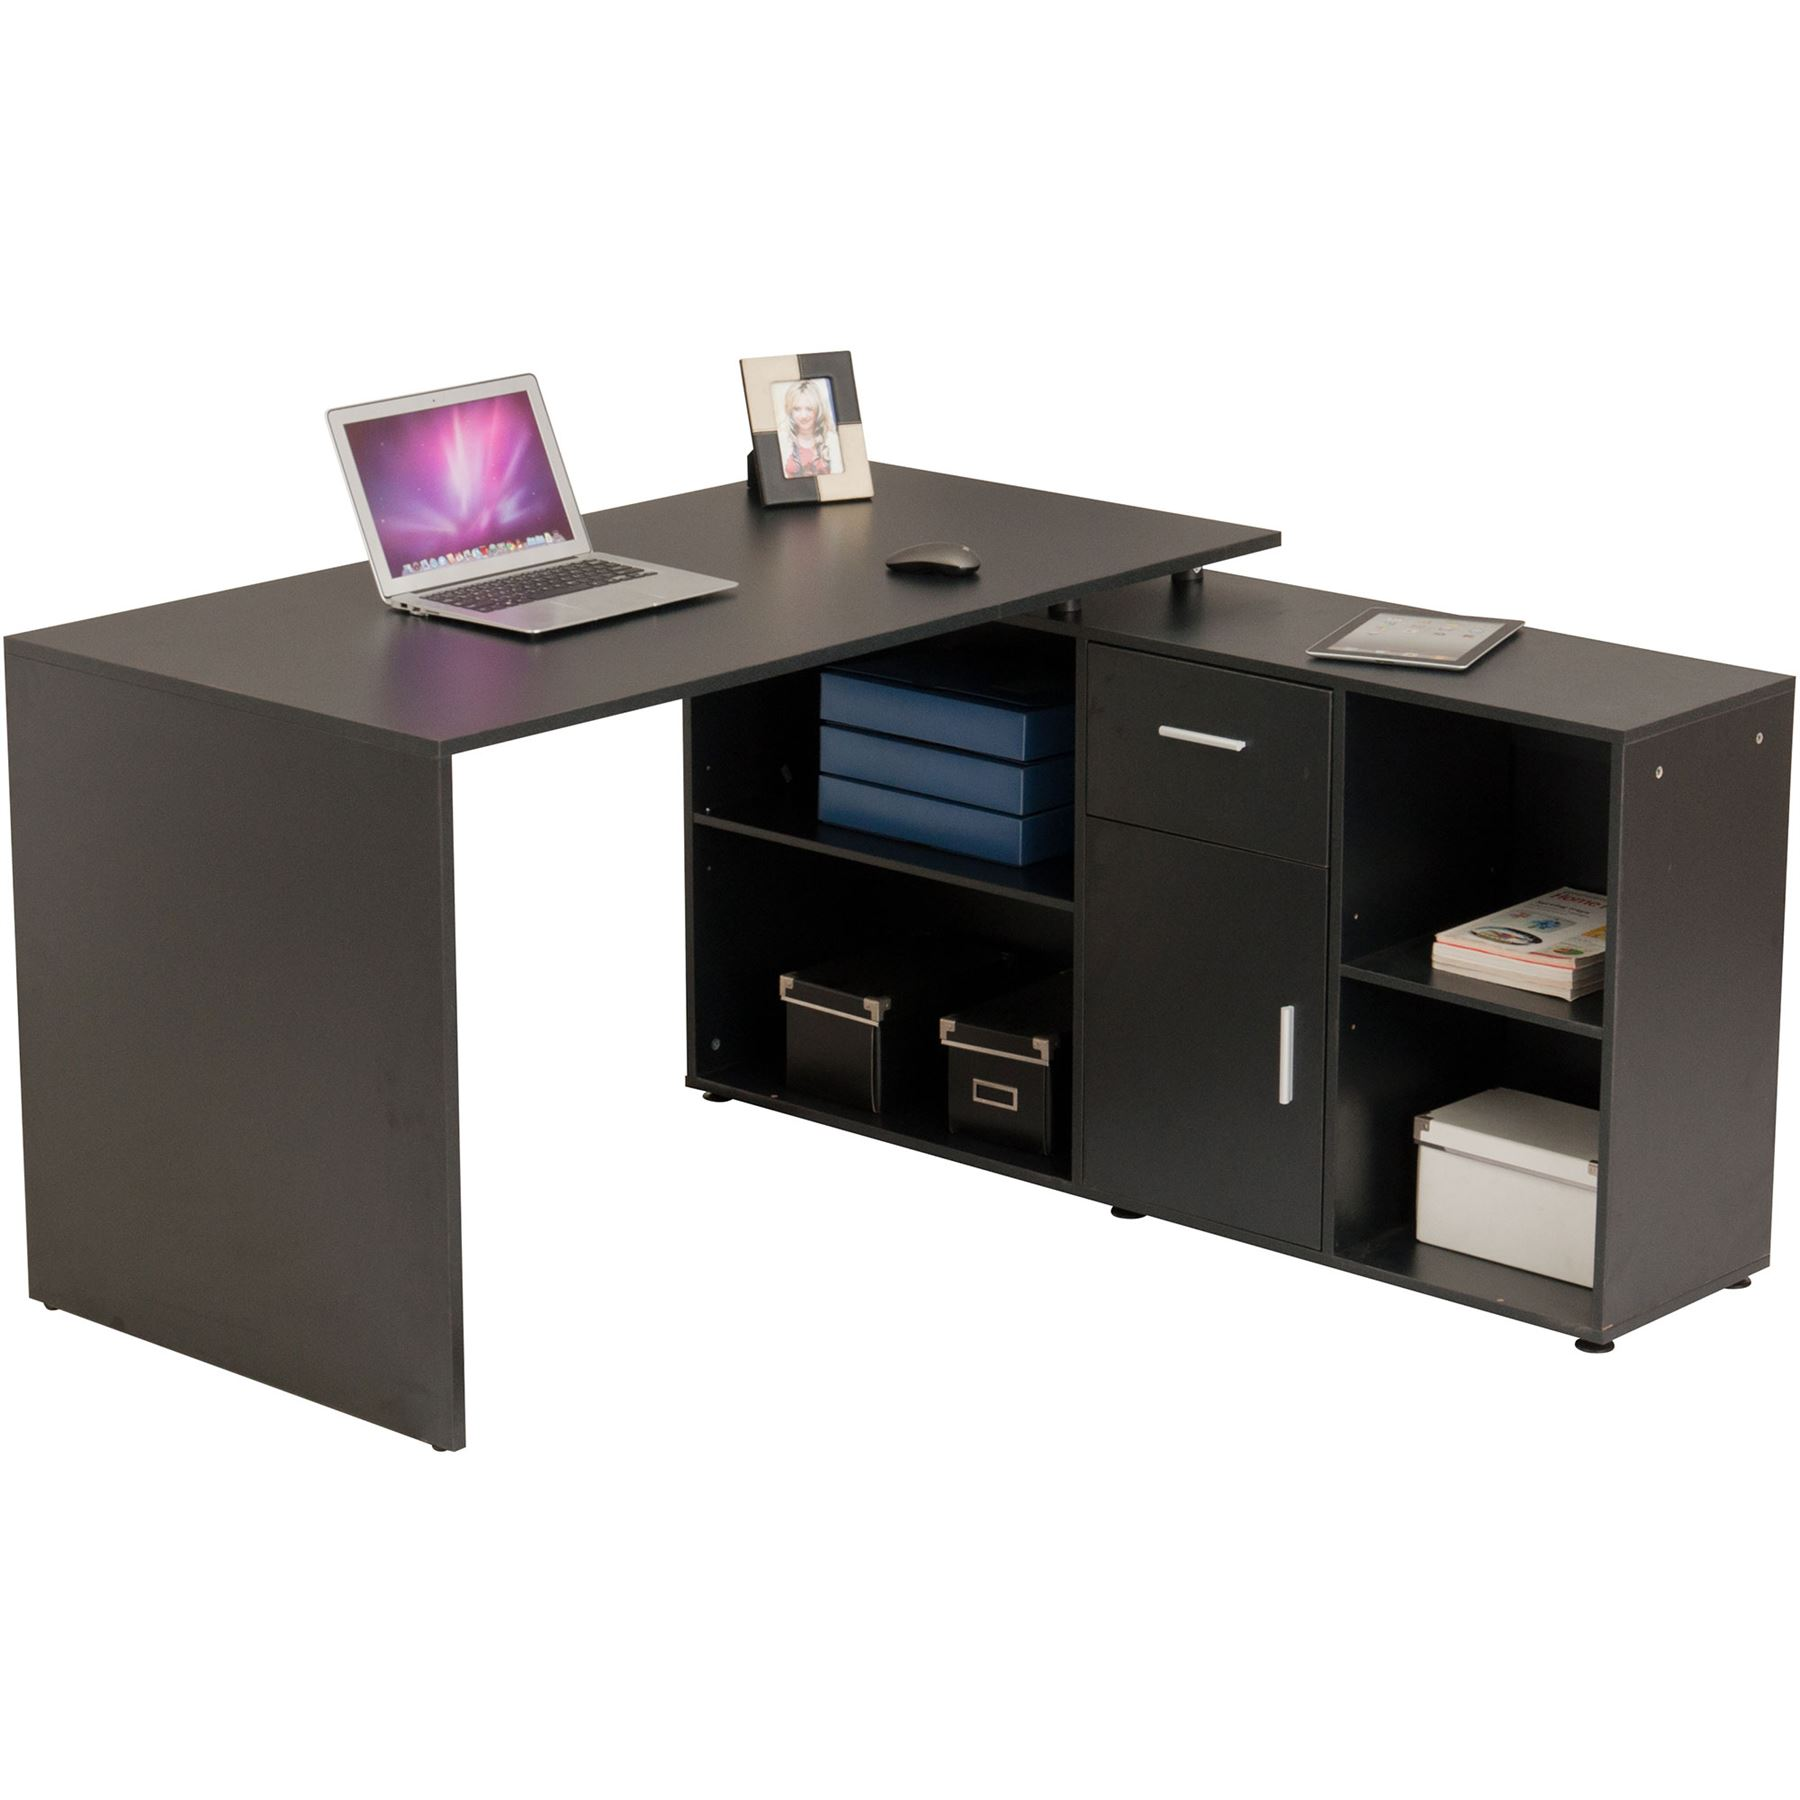 Folding Home Office Corner Desk Storage Multi Option Assembly Piranha Furniture Ebay